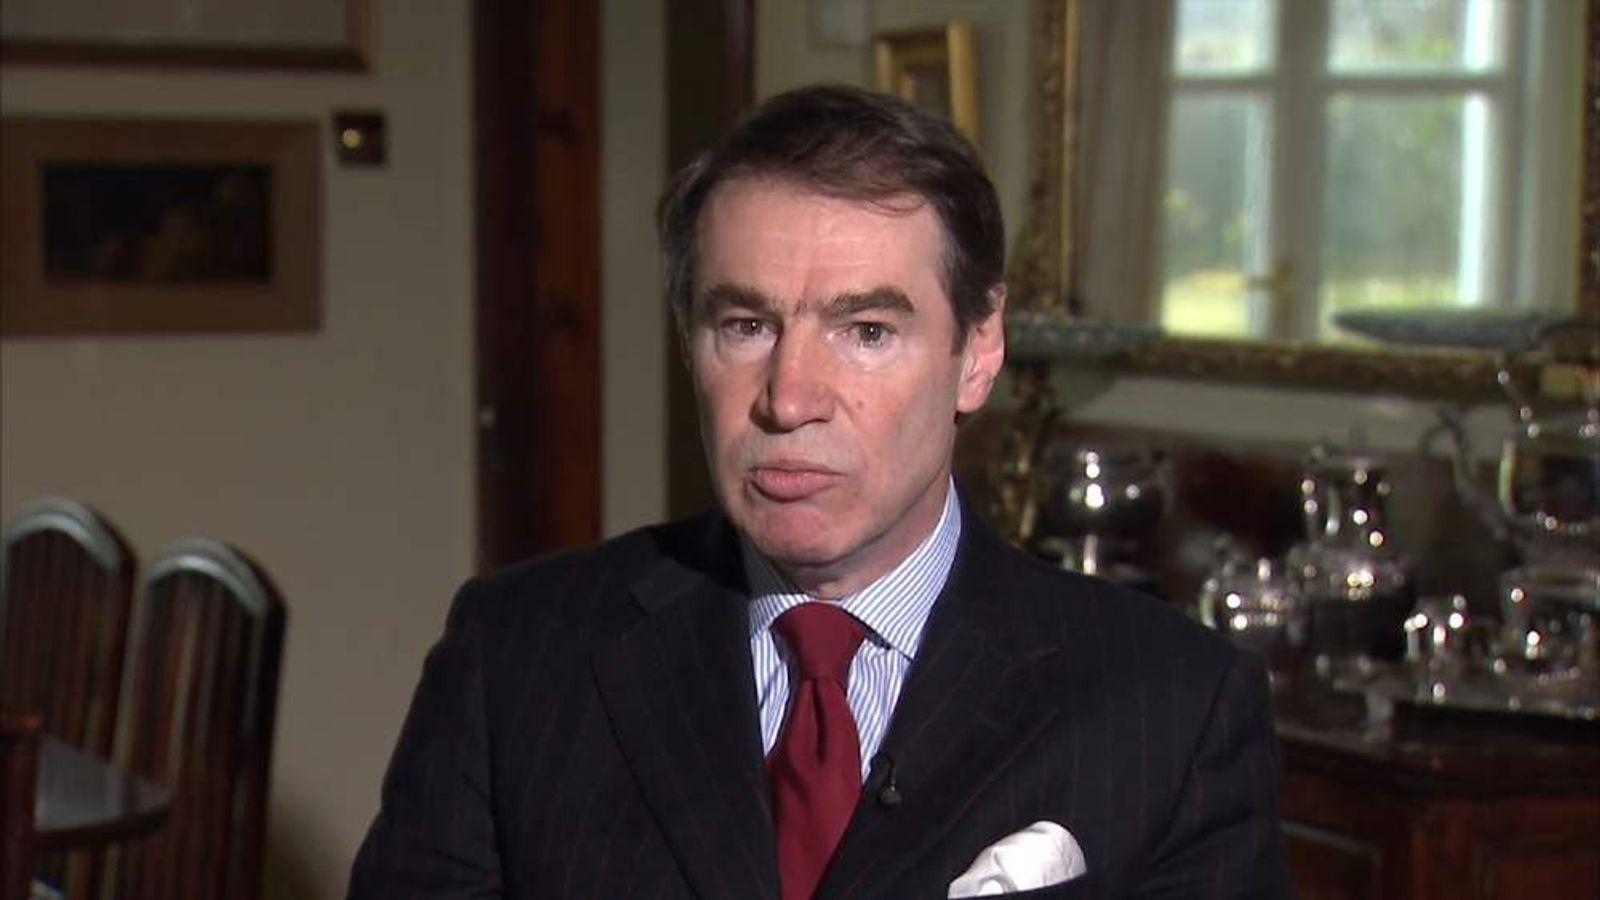 Donald MacLaren, a former British ambassador to Georgia